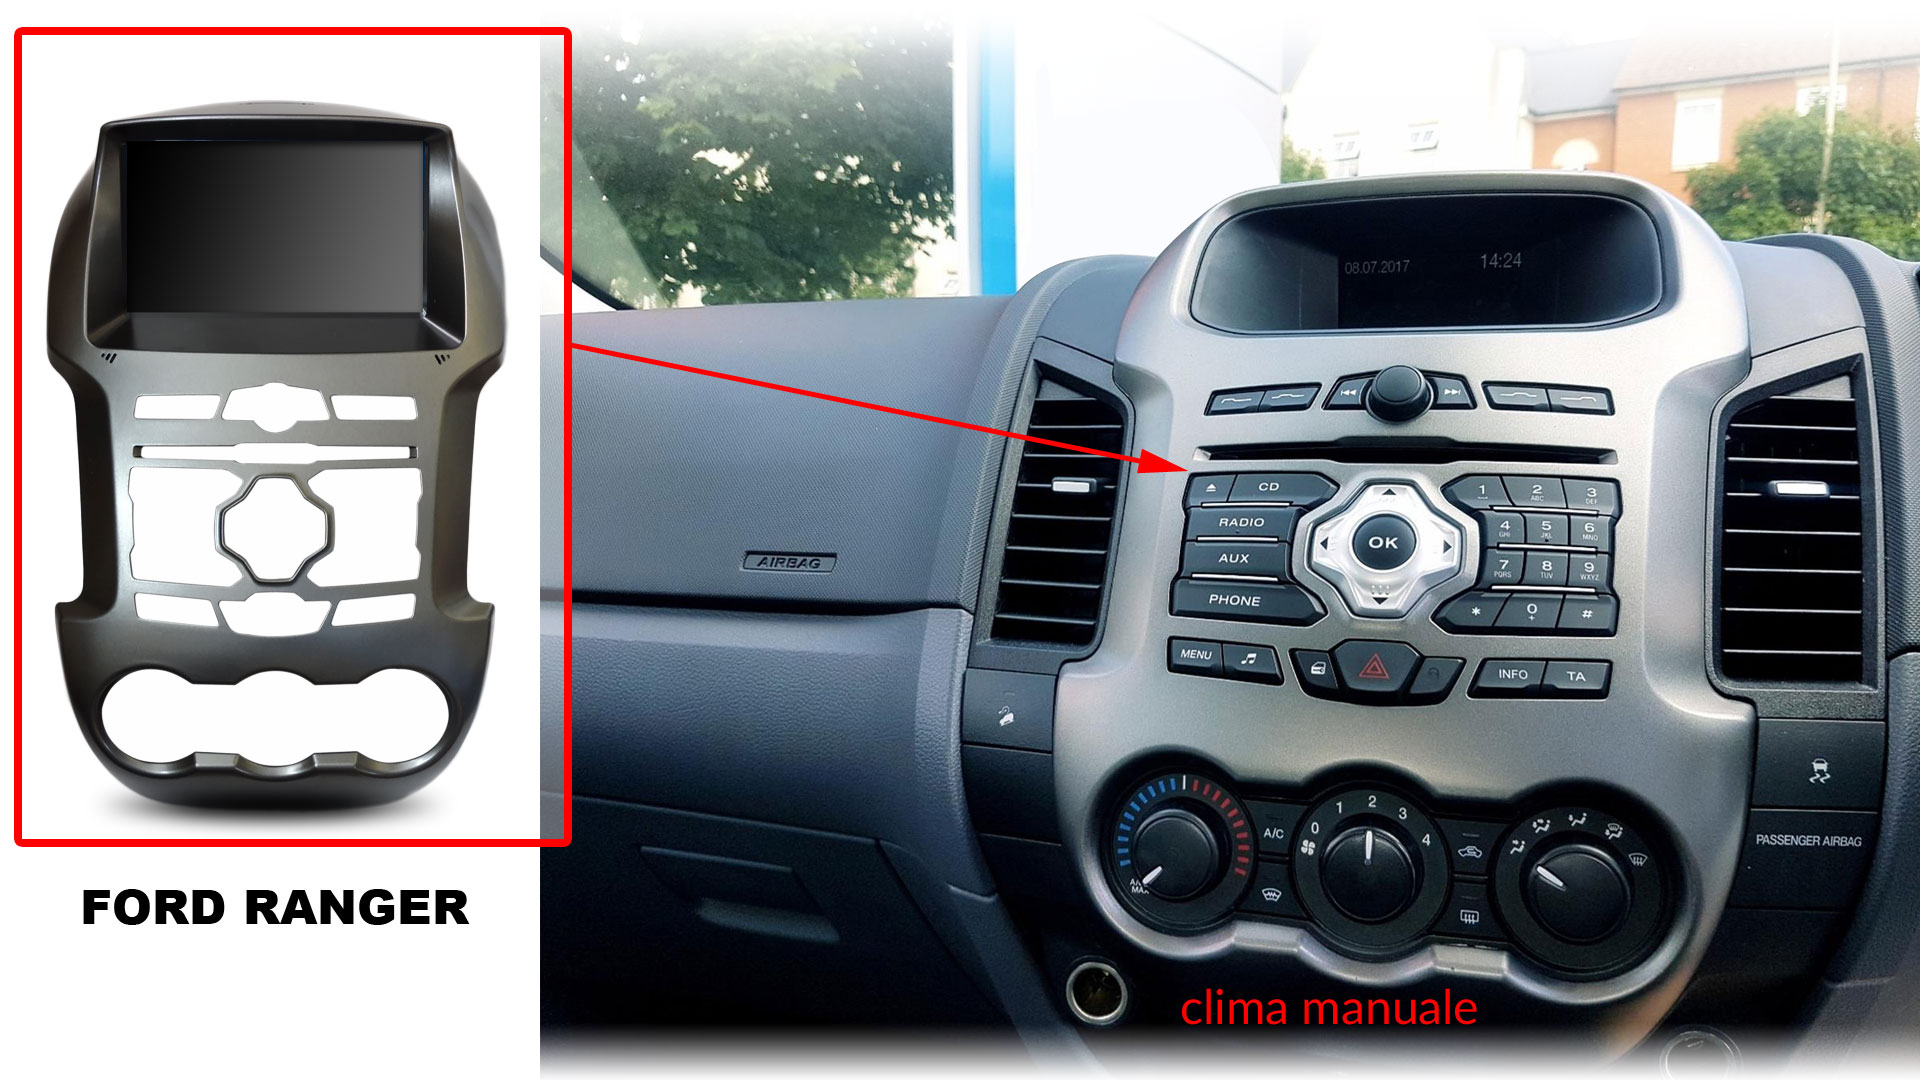 autoradio multimediale per Ford Ranger